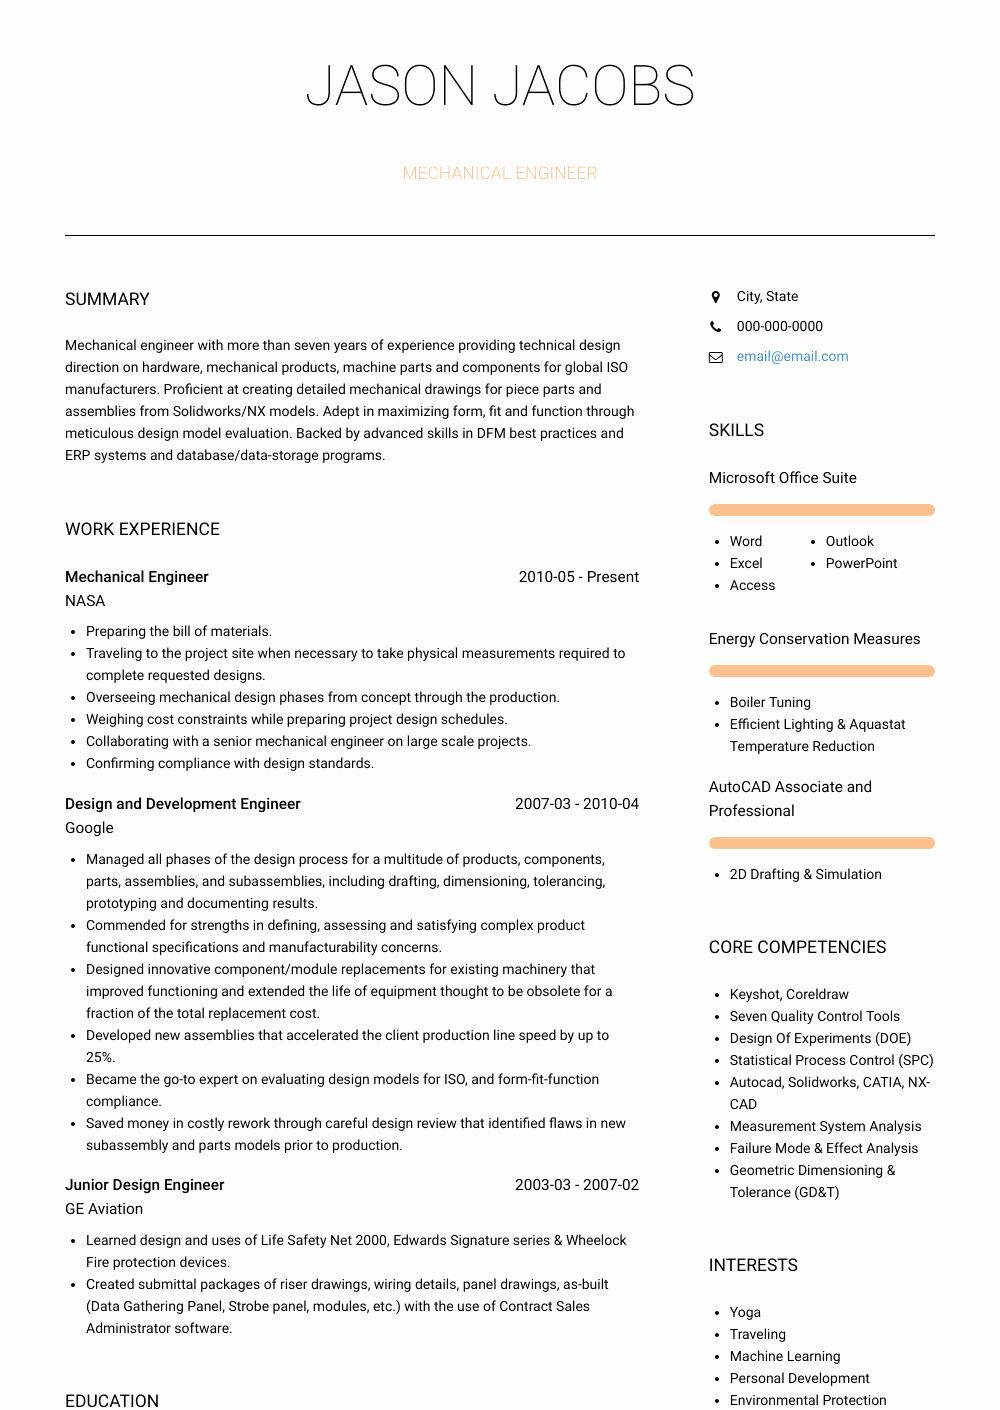 Sample Resume For Layout Design Engineer